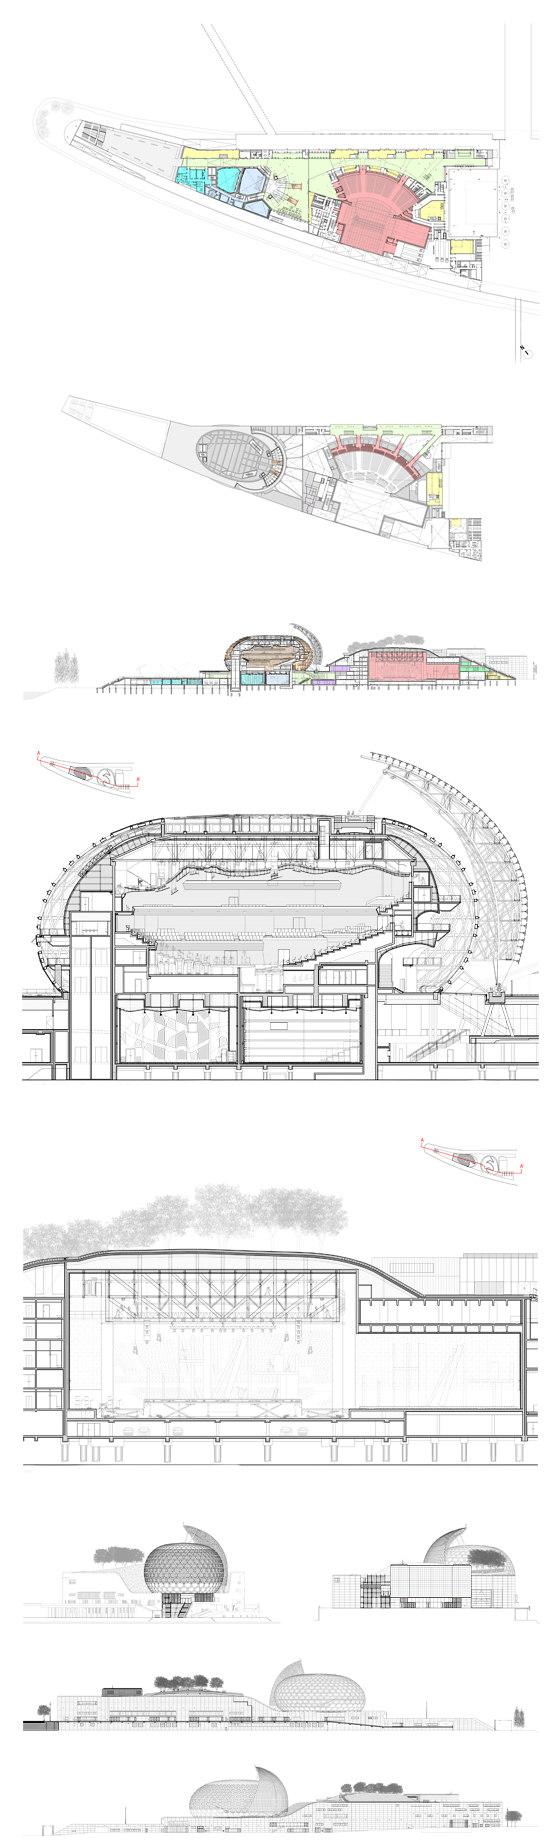 La Seine Musicale by Shigeru Ban Architects   Concert halls